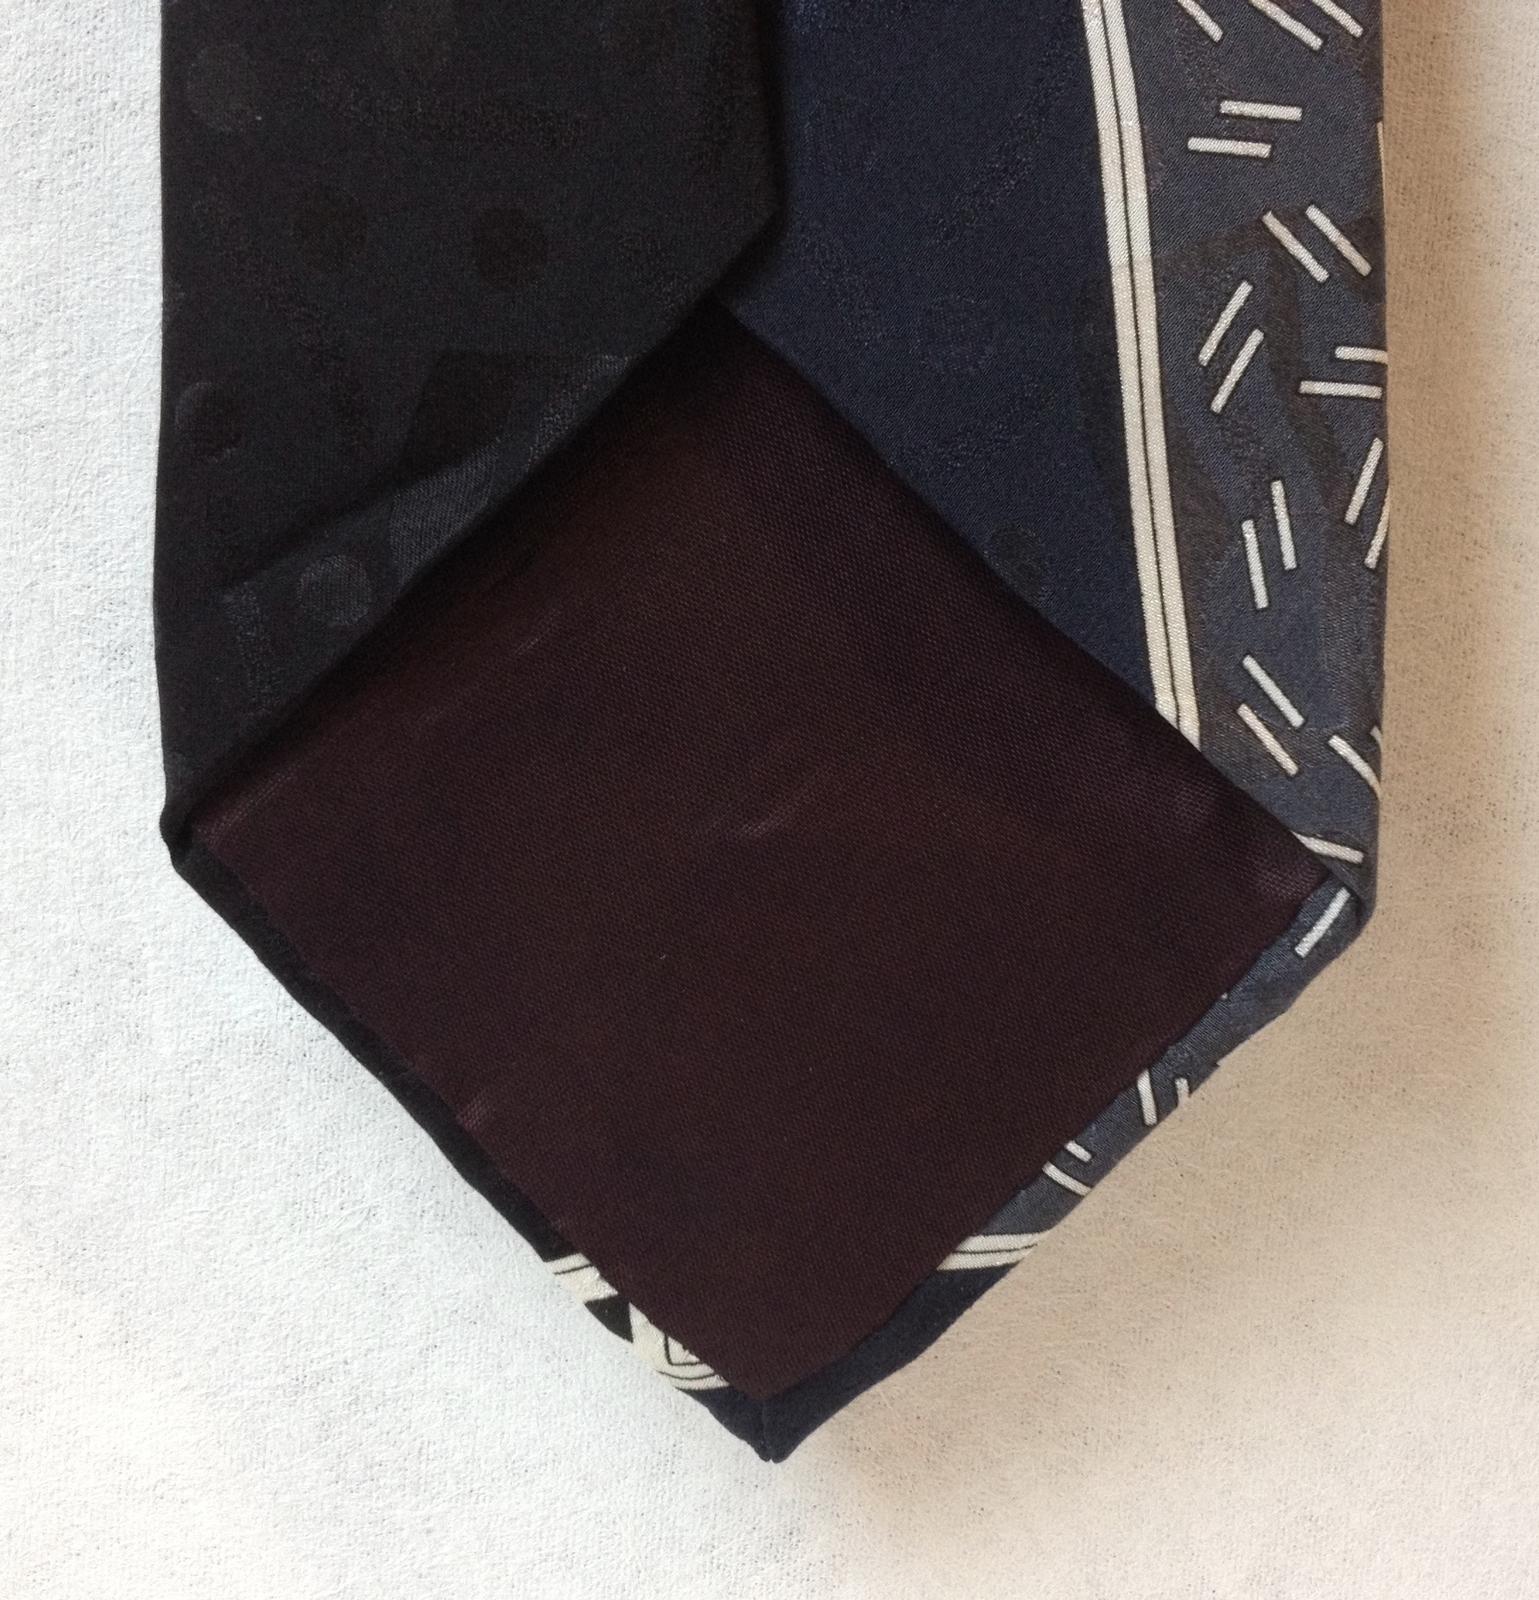 Marina Di Carrara Black Navy Blue Gray Neck Tie 100% Silk Geometric Modern Lines